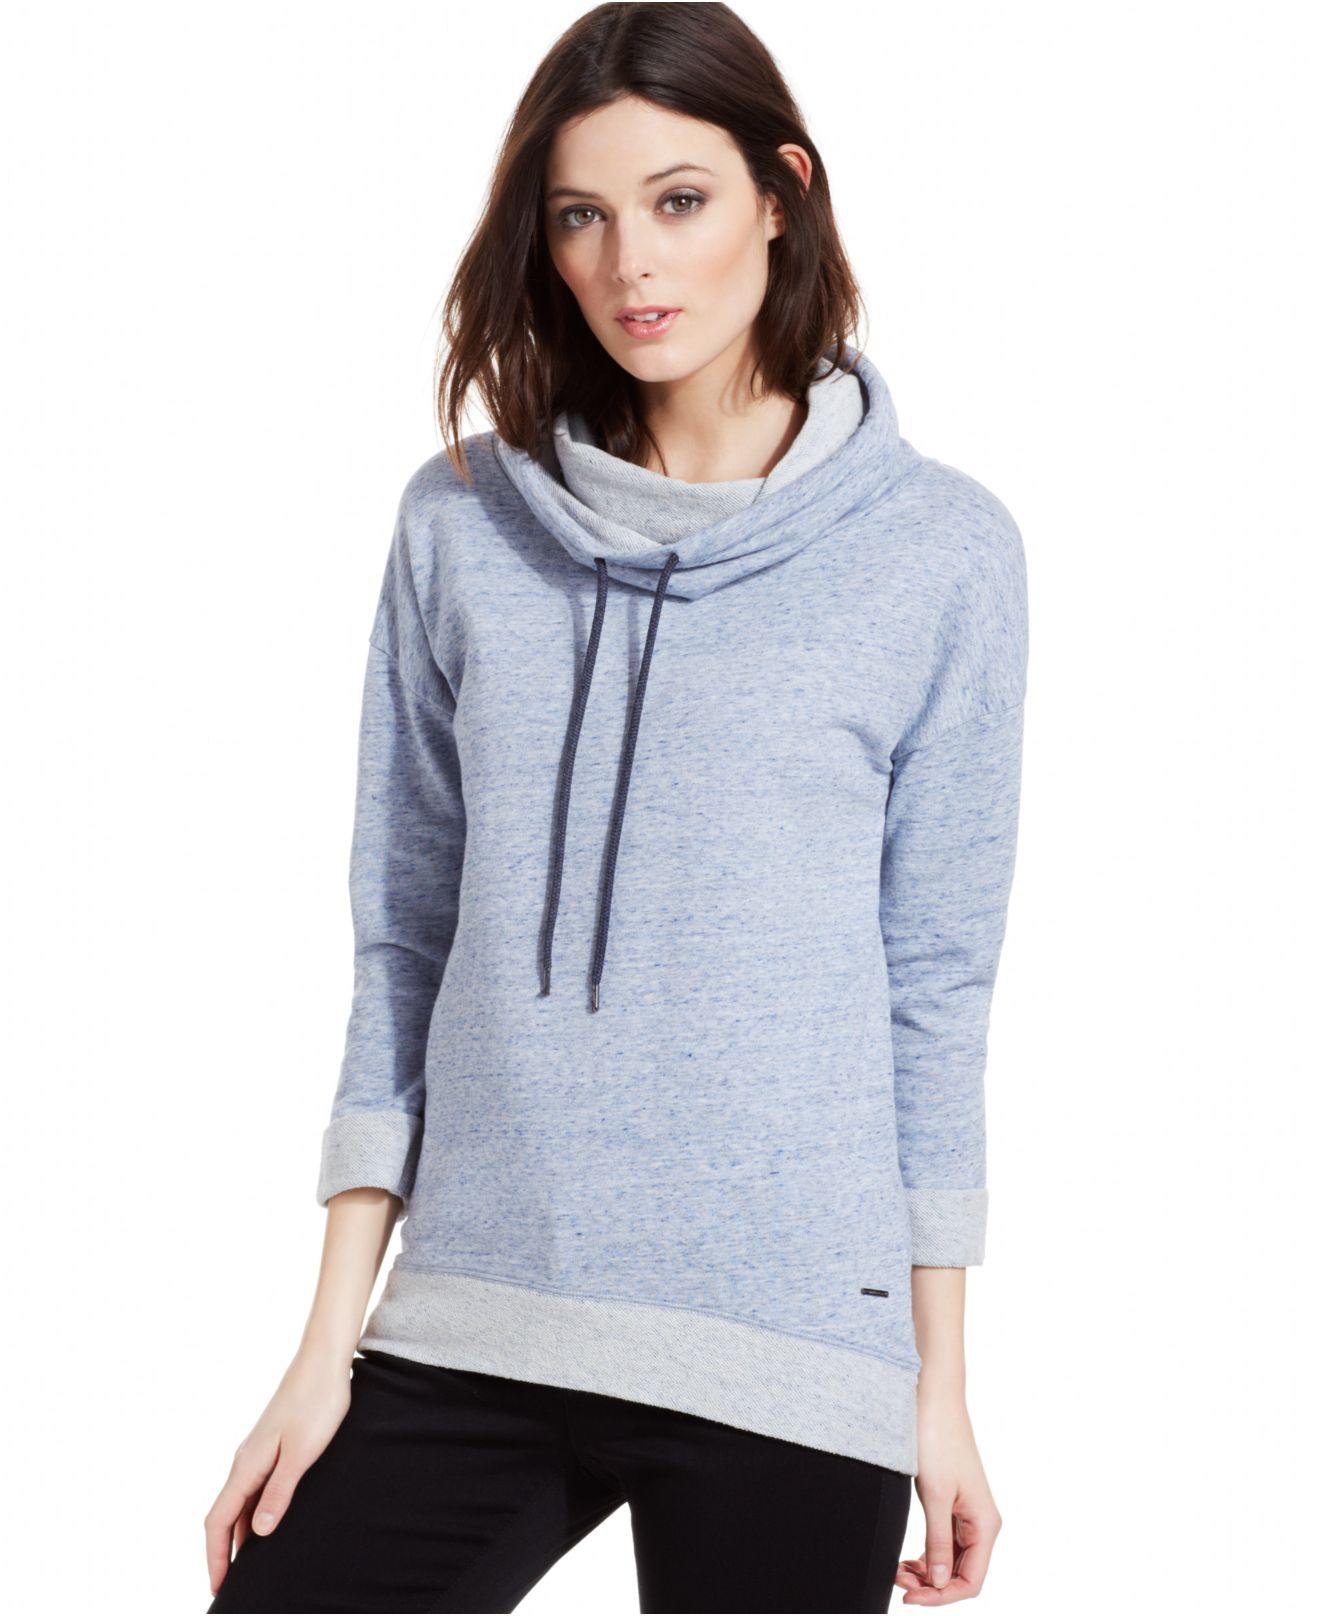 calvin klein jeans long sleeve cowl neck sweatshirt in. Black Bedroom Furniture Sets. Home Design Ideas